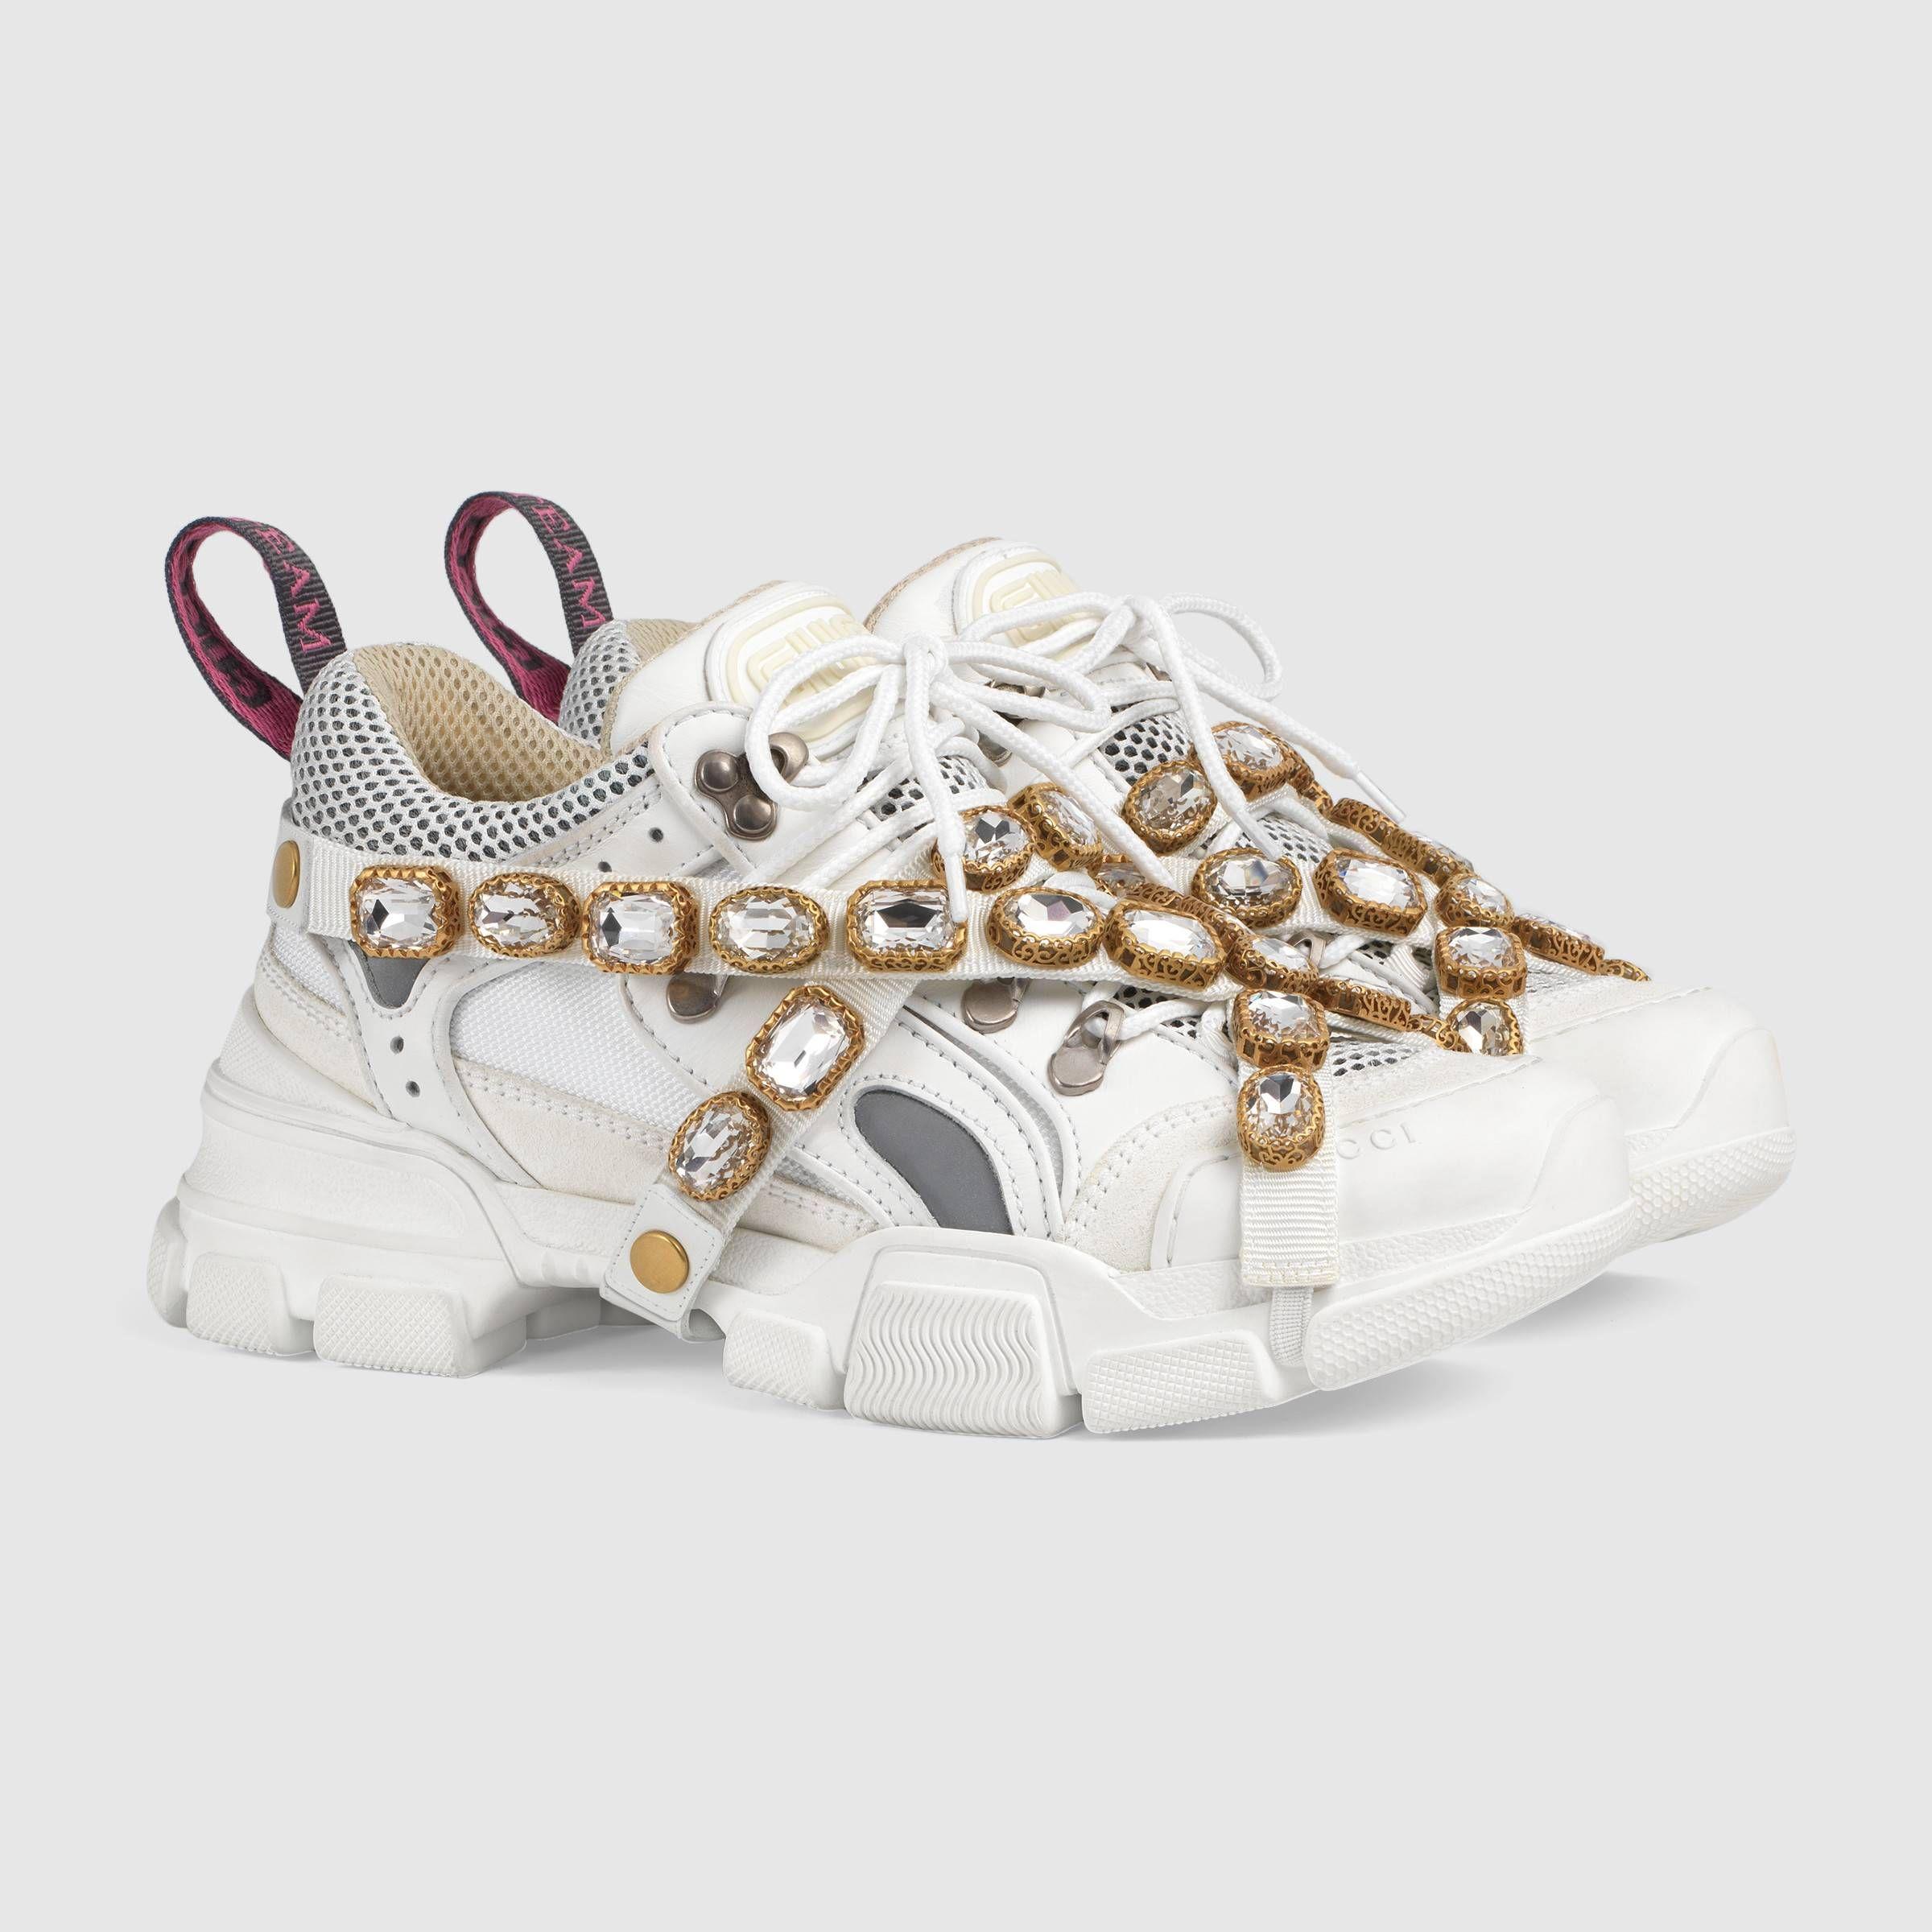 Gucci ace sneakers, Sneakers, Women